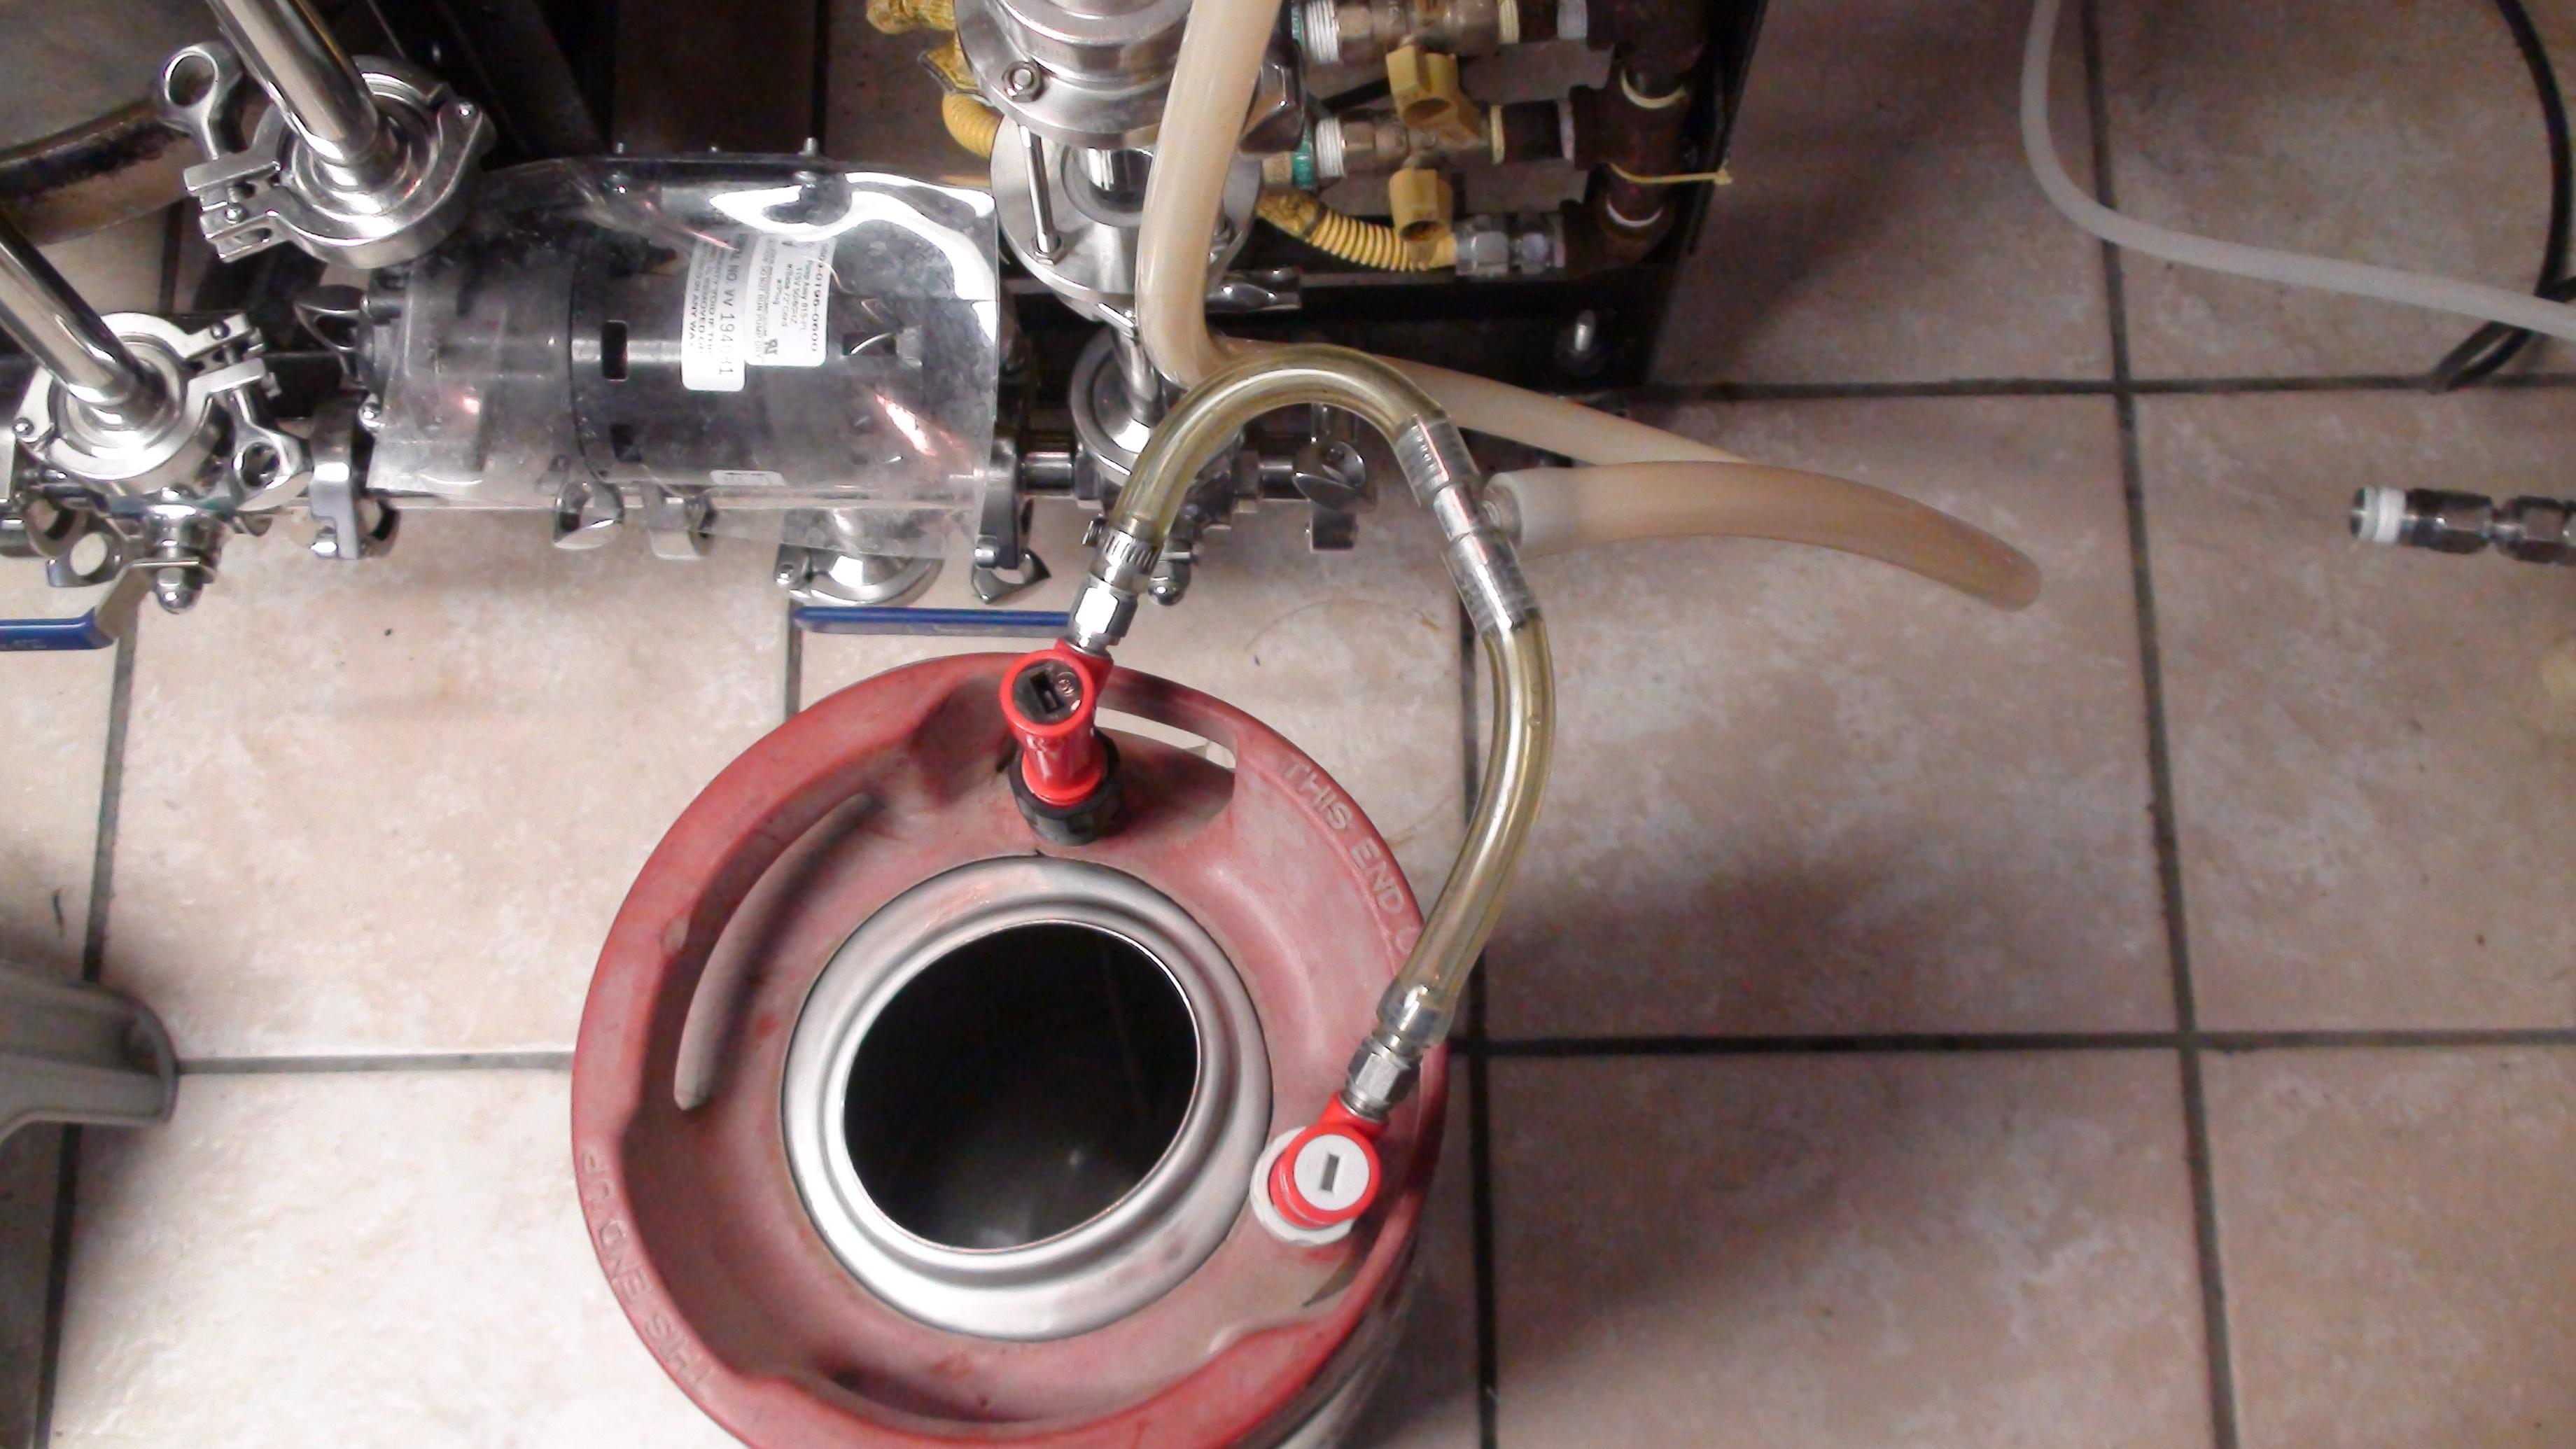 Keg cleaning halfbarrelbrewer step 3 turn pump on to start recirculation add 4 oz pbw to mash tun publicscrutiny Images